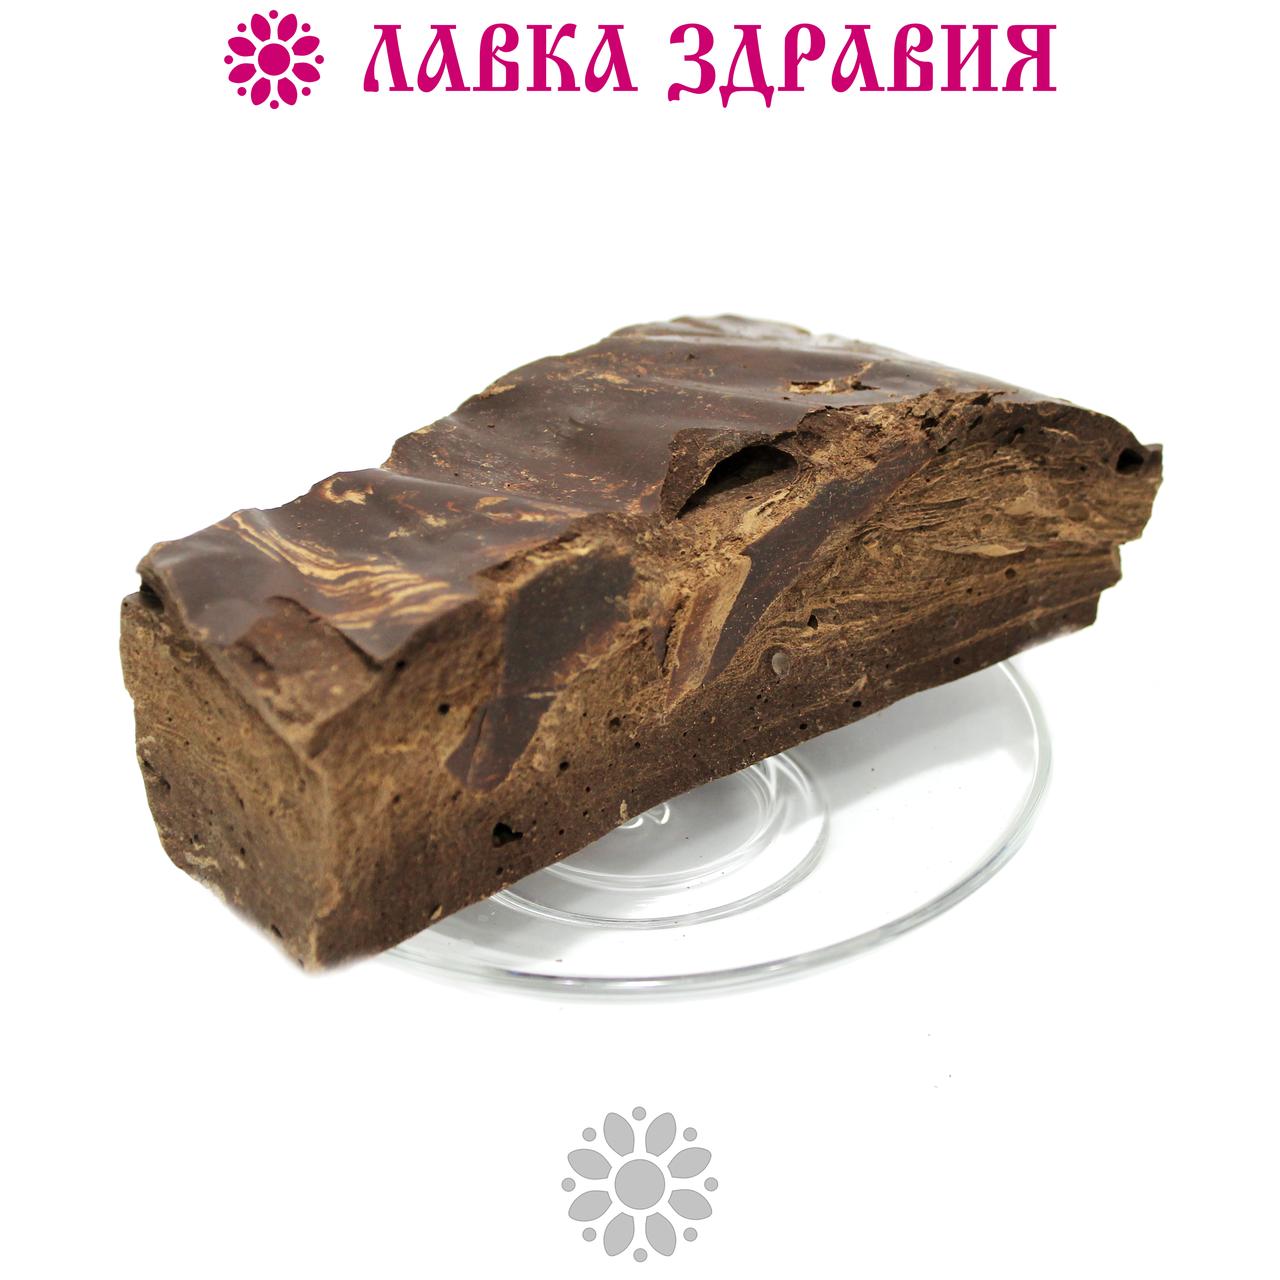 Какао тертое натуральное ТМ Монделиз, Украина, 1 кг